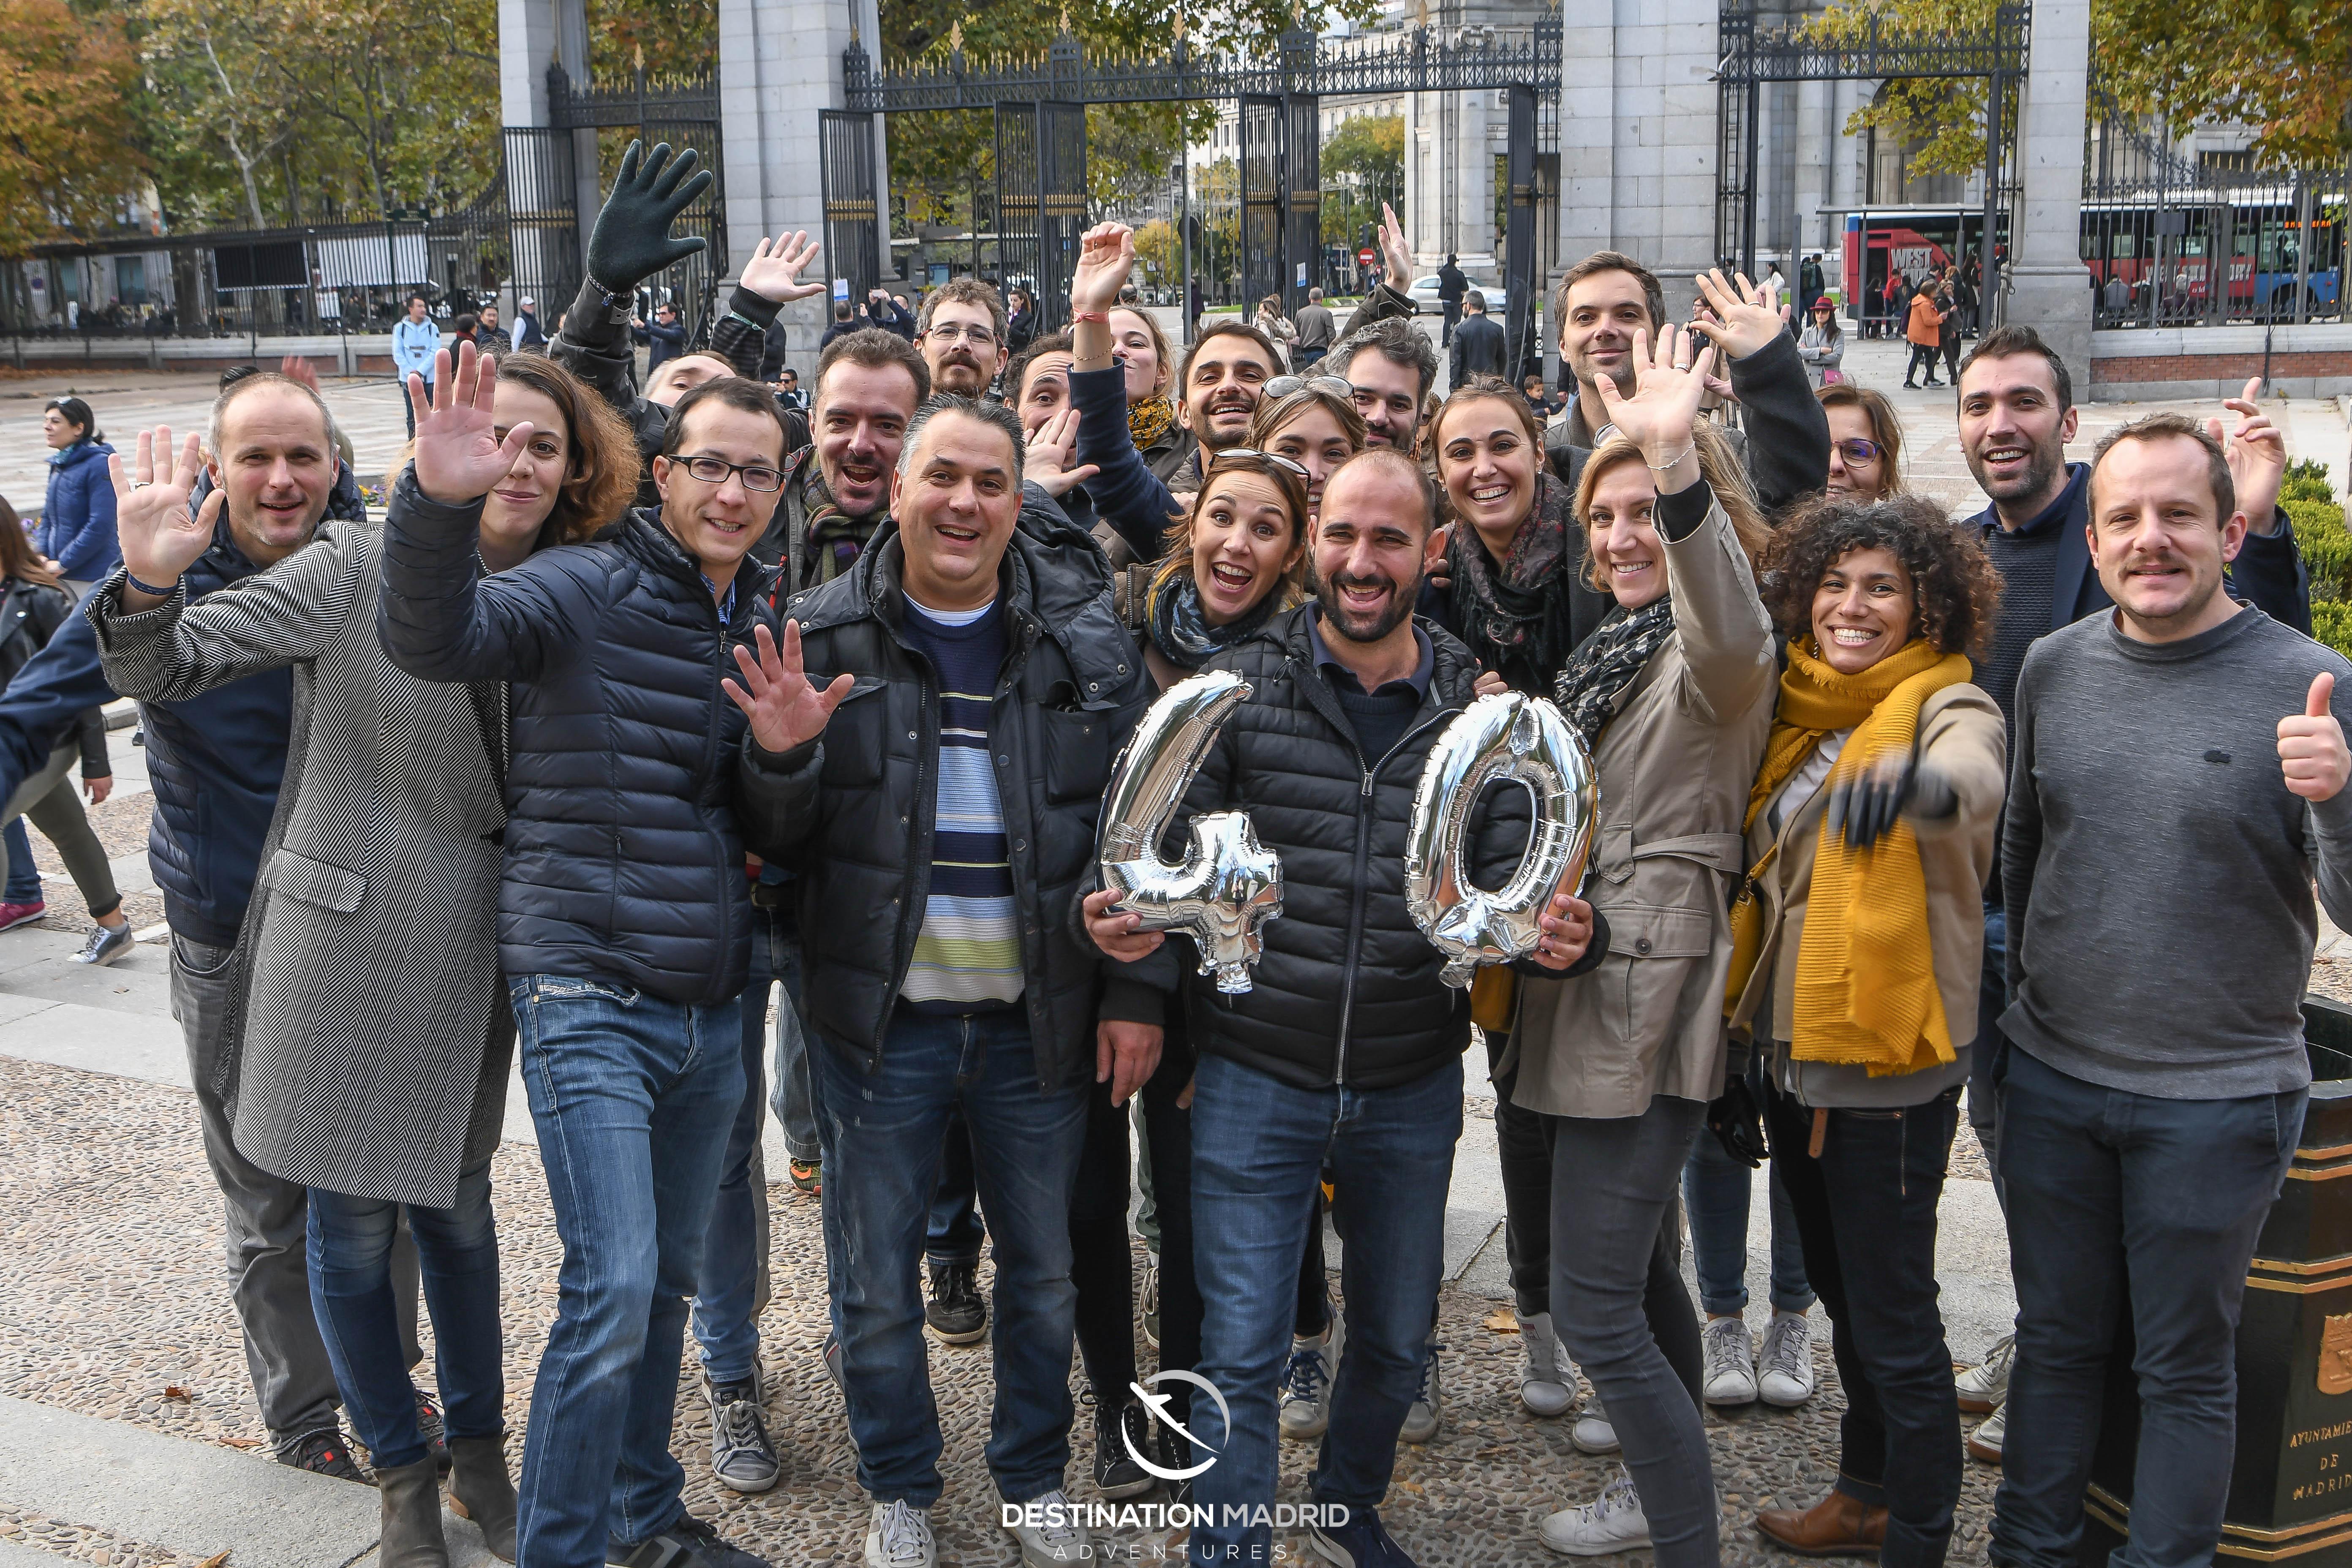 organiser son anniversaire à Madrid - DESTINATION MADRID